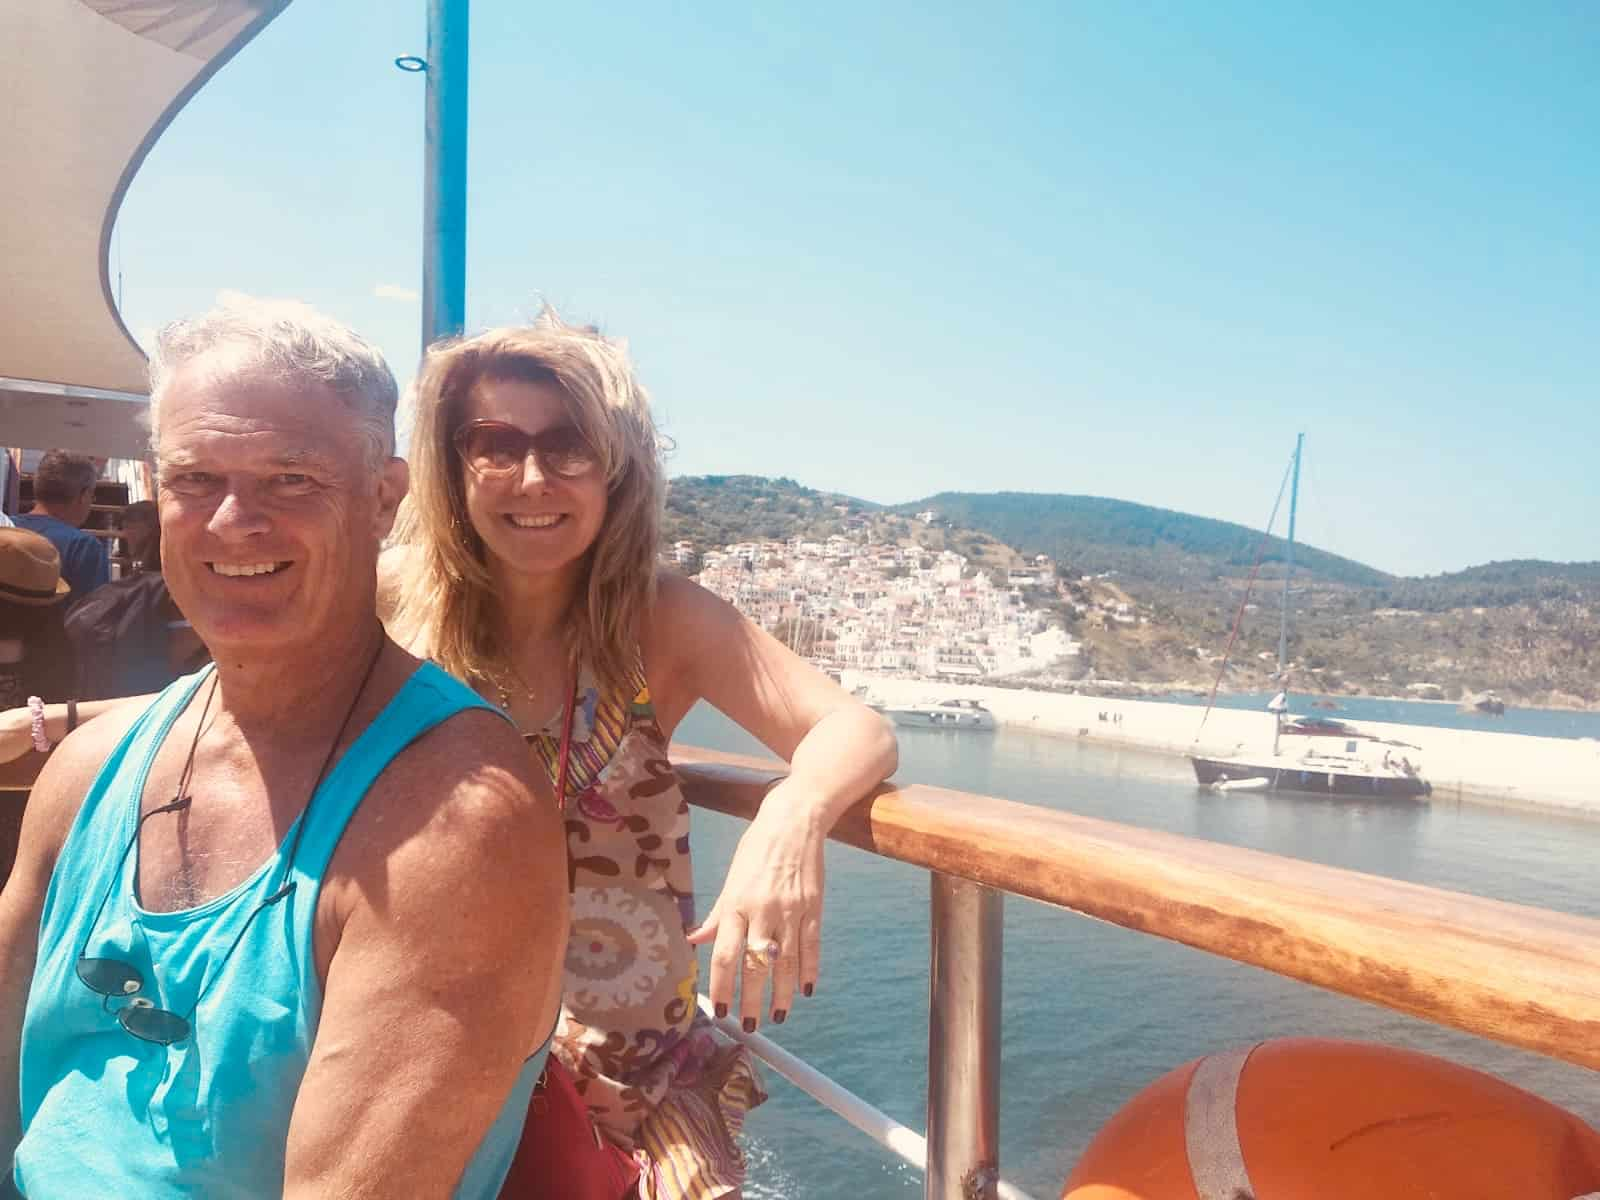 On the Greek ferry between Skiathos and Skopelos.